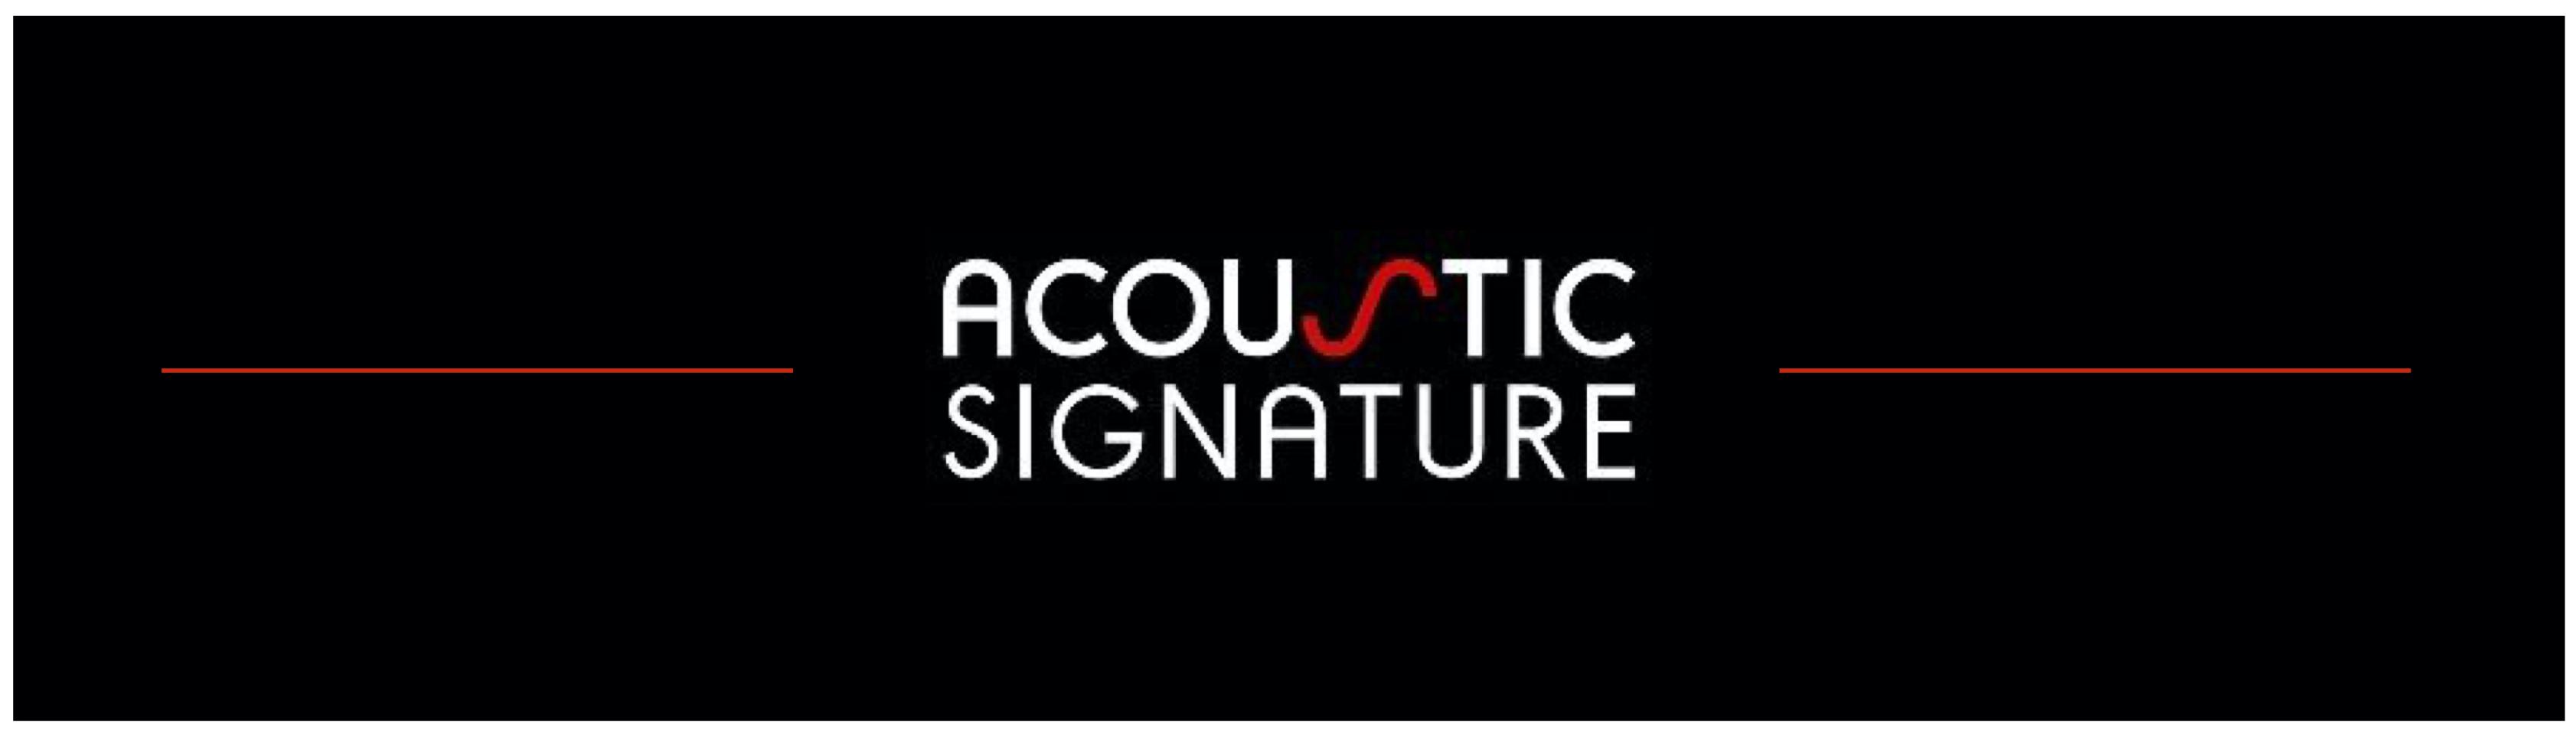 acoustic-signature-logo.jpg